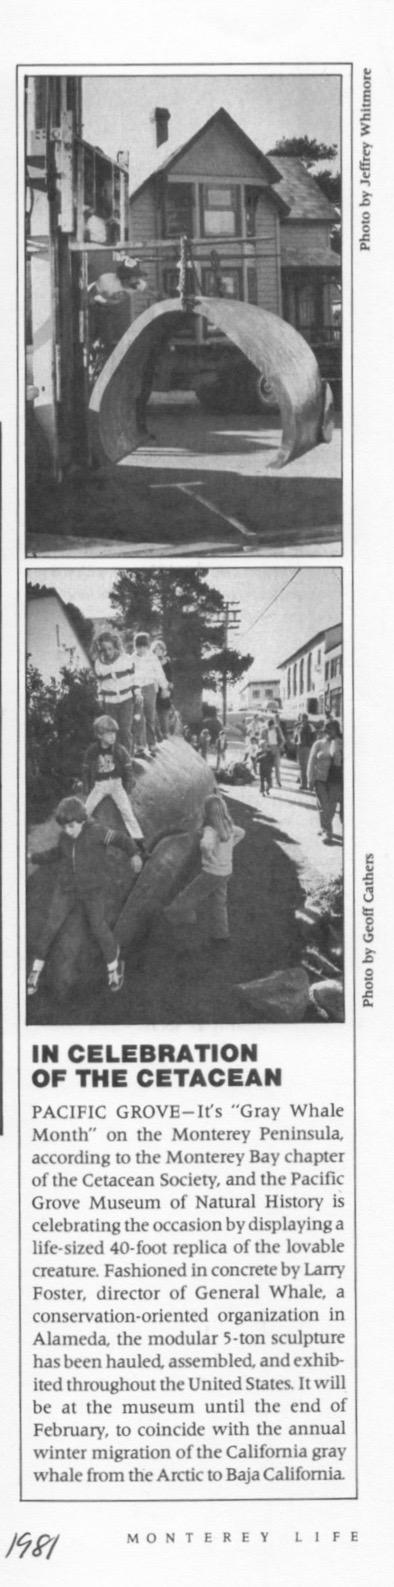 01-00-81 In Celebration of the Cetacean MOnterey Life  p 24 2 copy.jpg